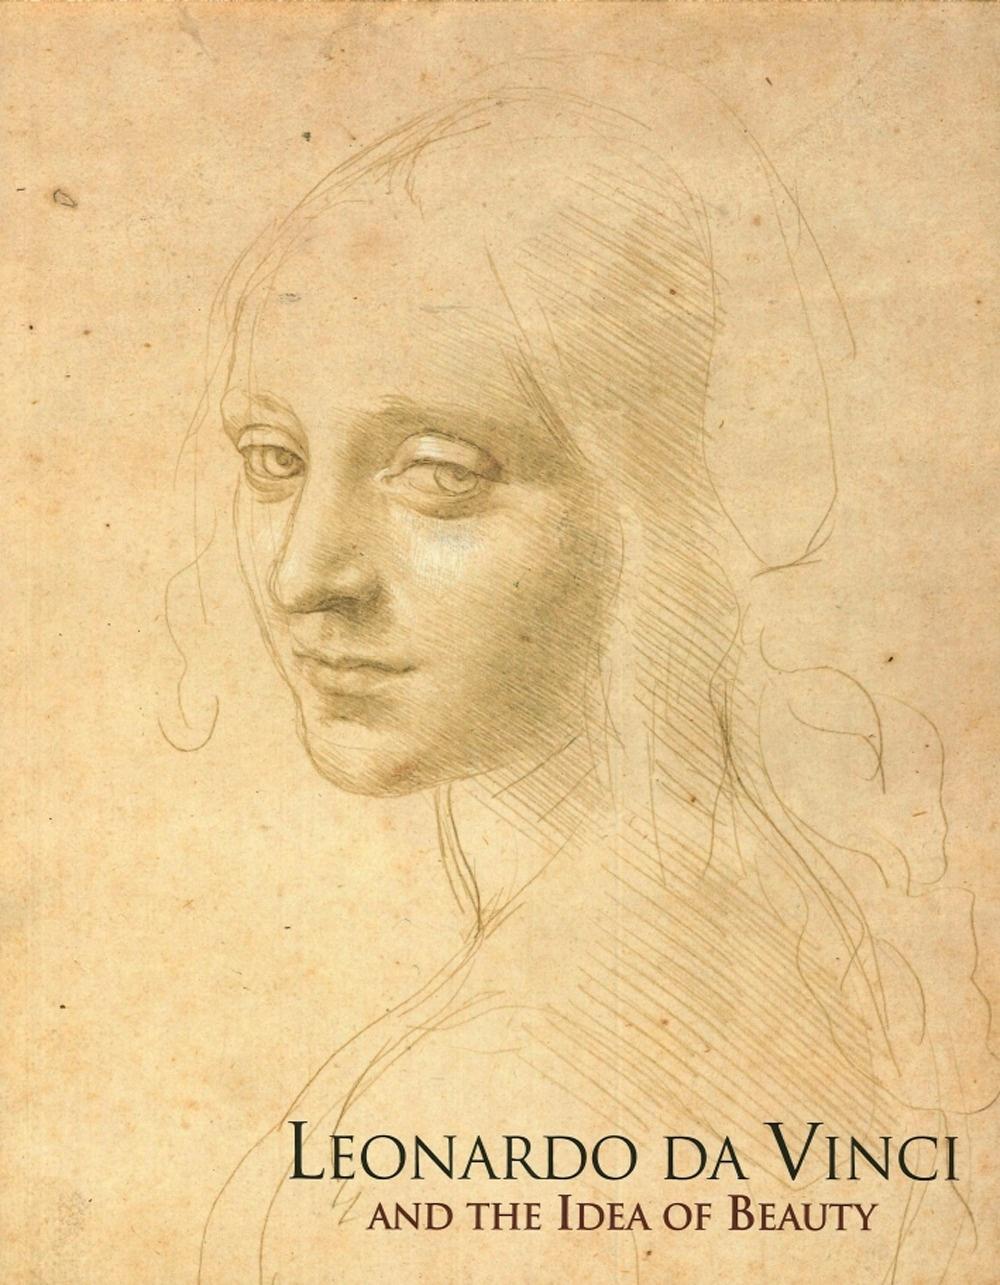 Leonardo Da Vinci and the Idea of Beauty